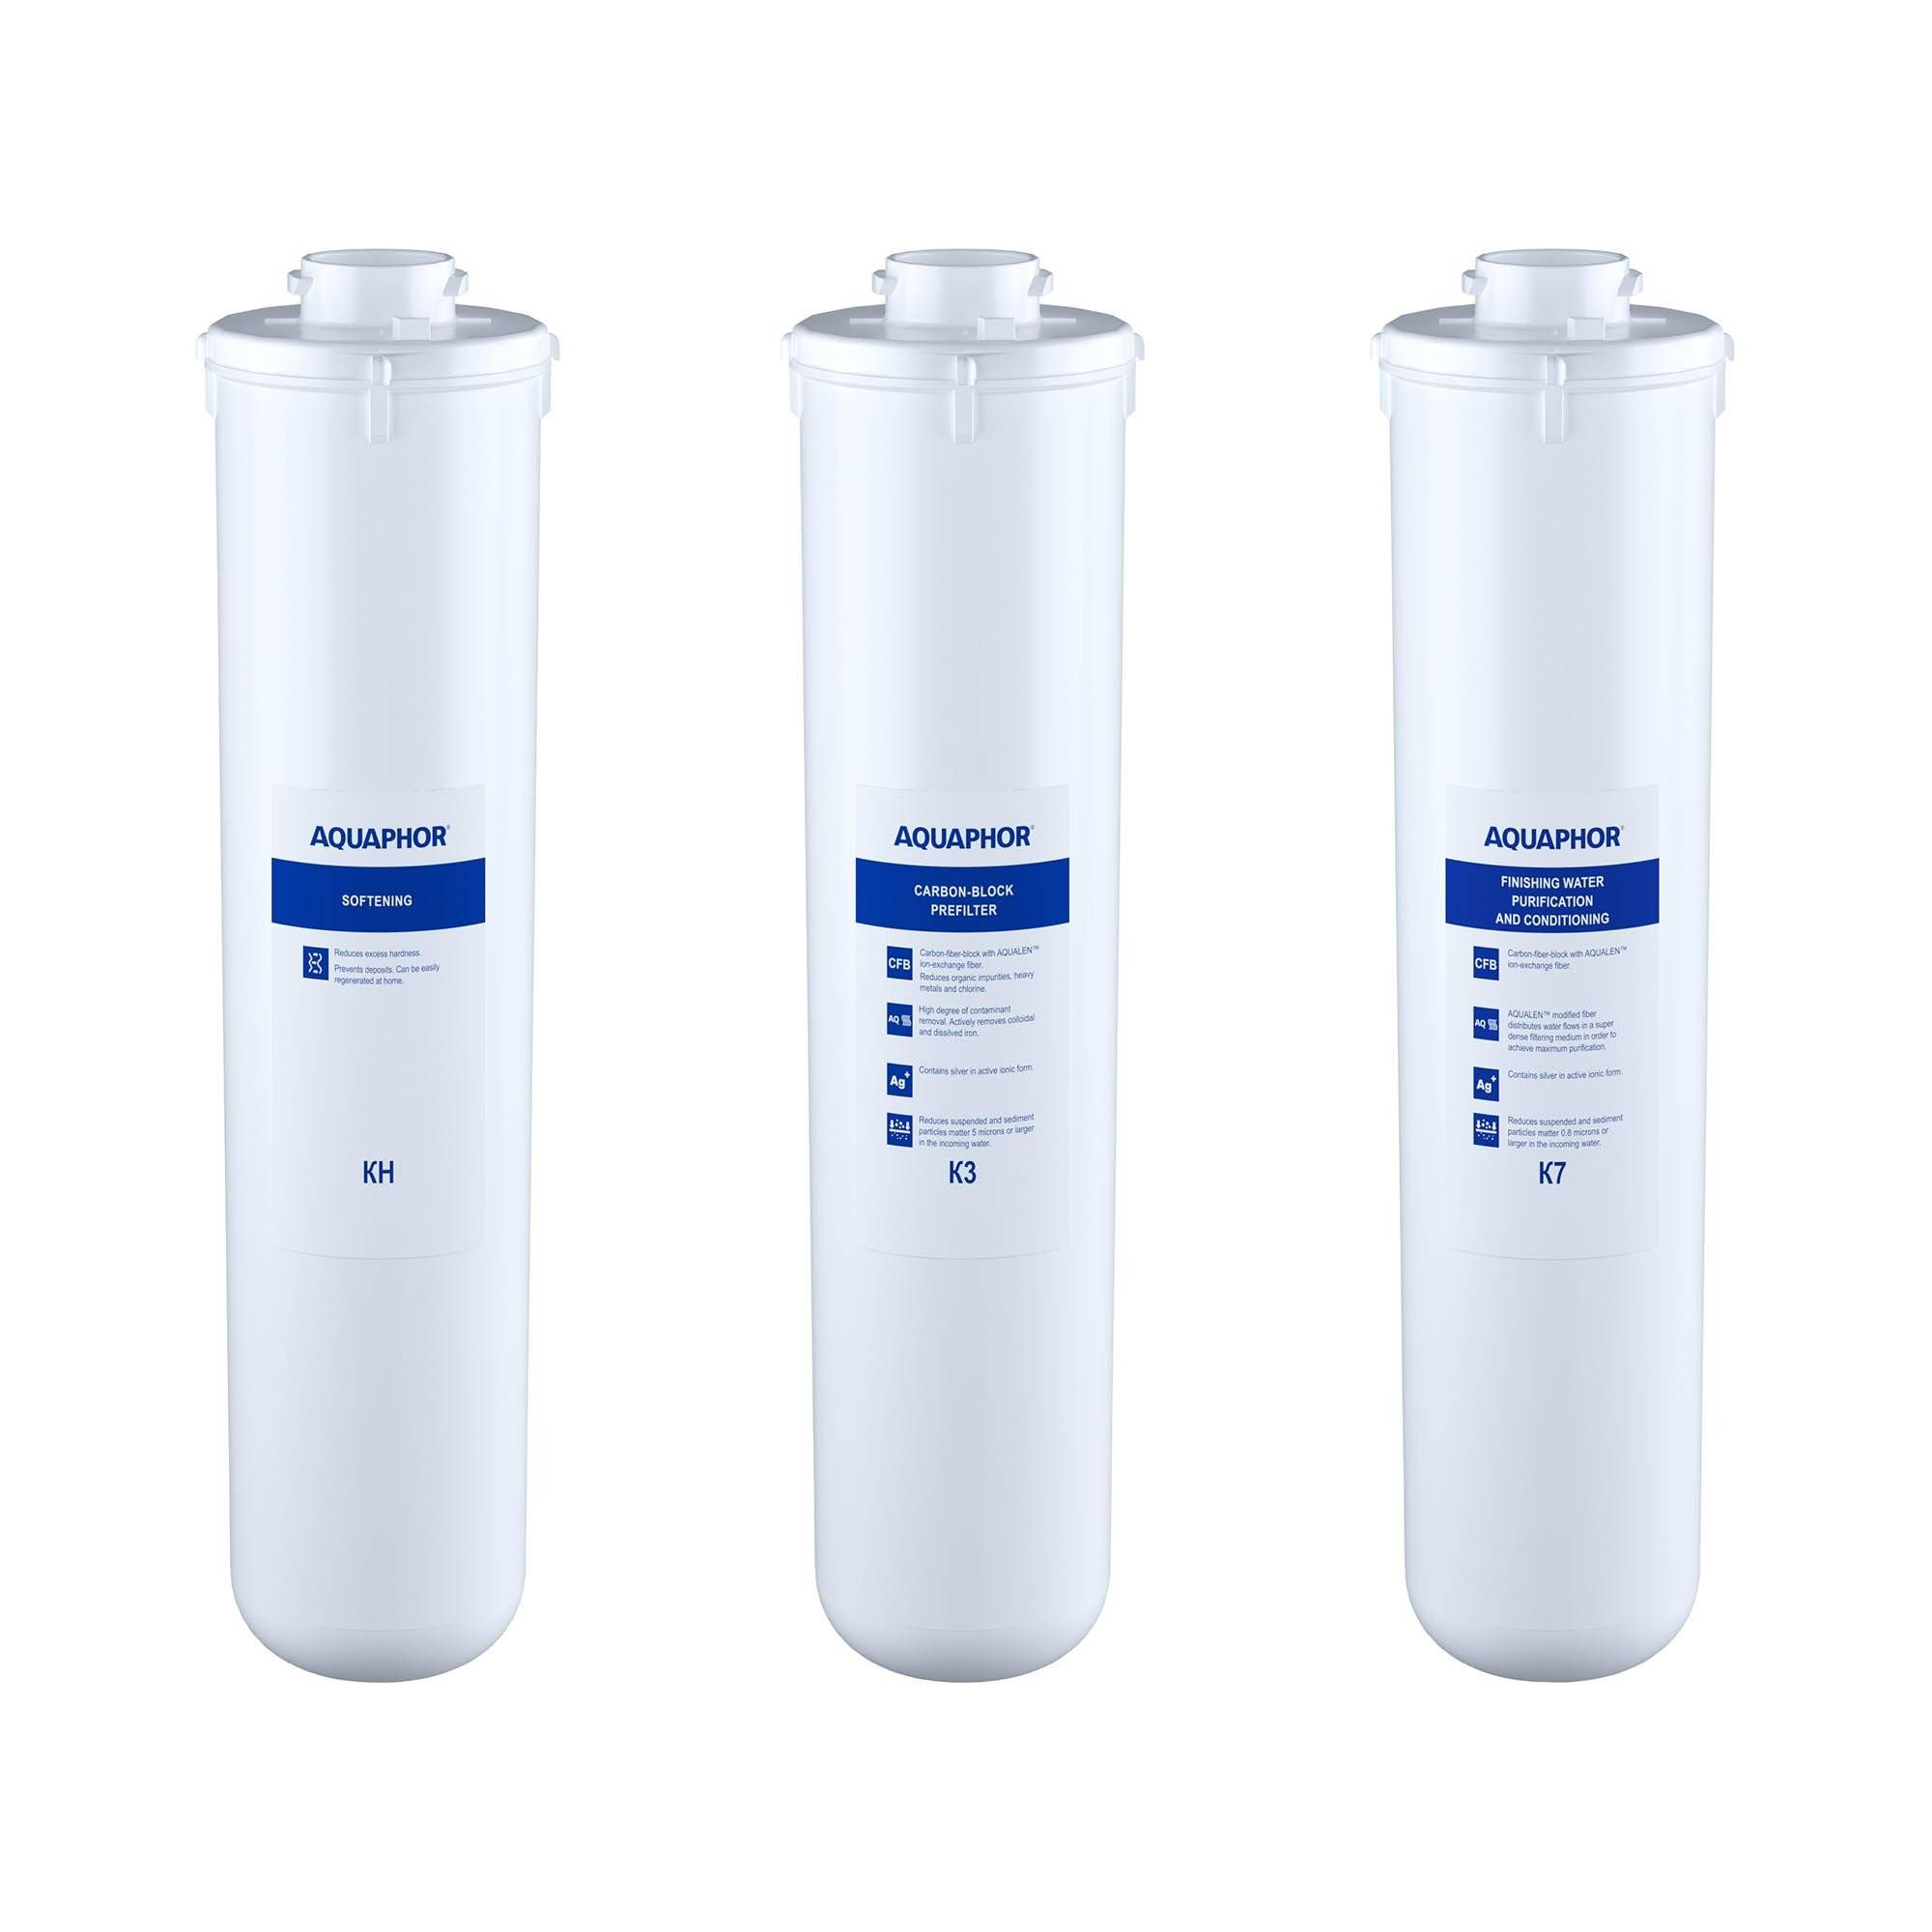 Aquaphor Filtre à charbon actif eau Aquaphor - Kit de filtres de rechange avec filtre calcaire CRYSTAL H FILTERS